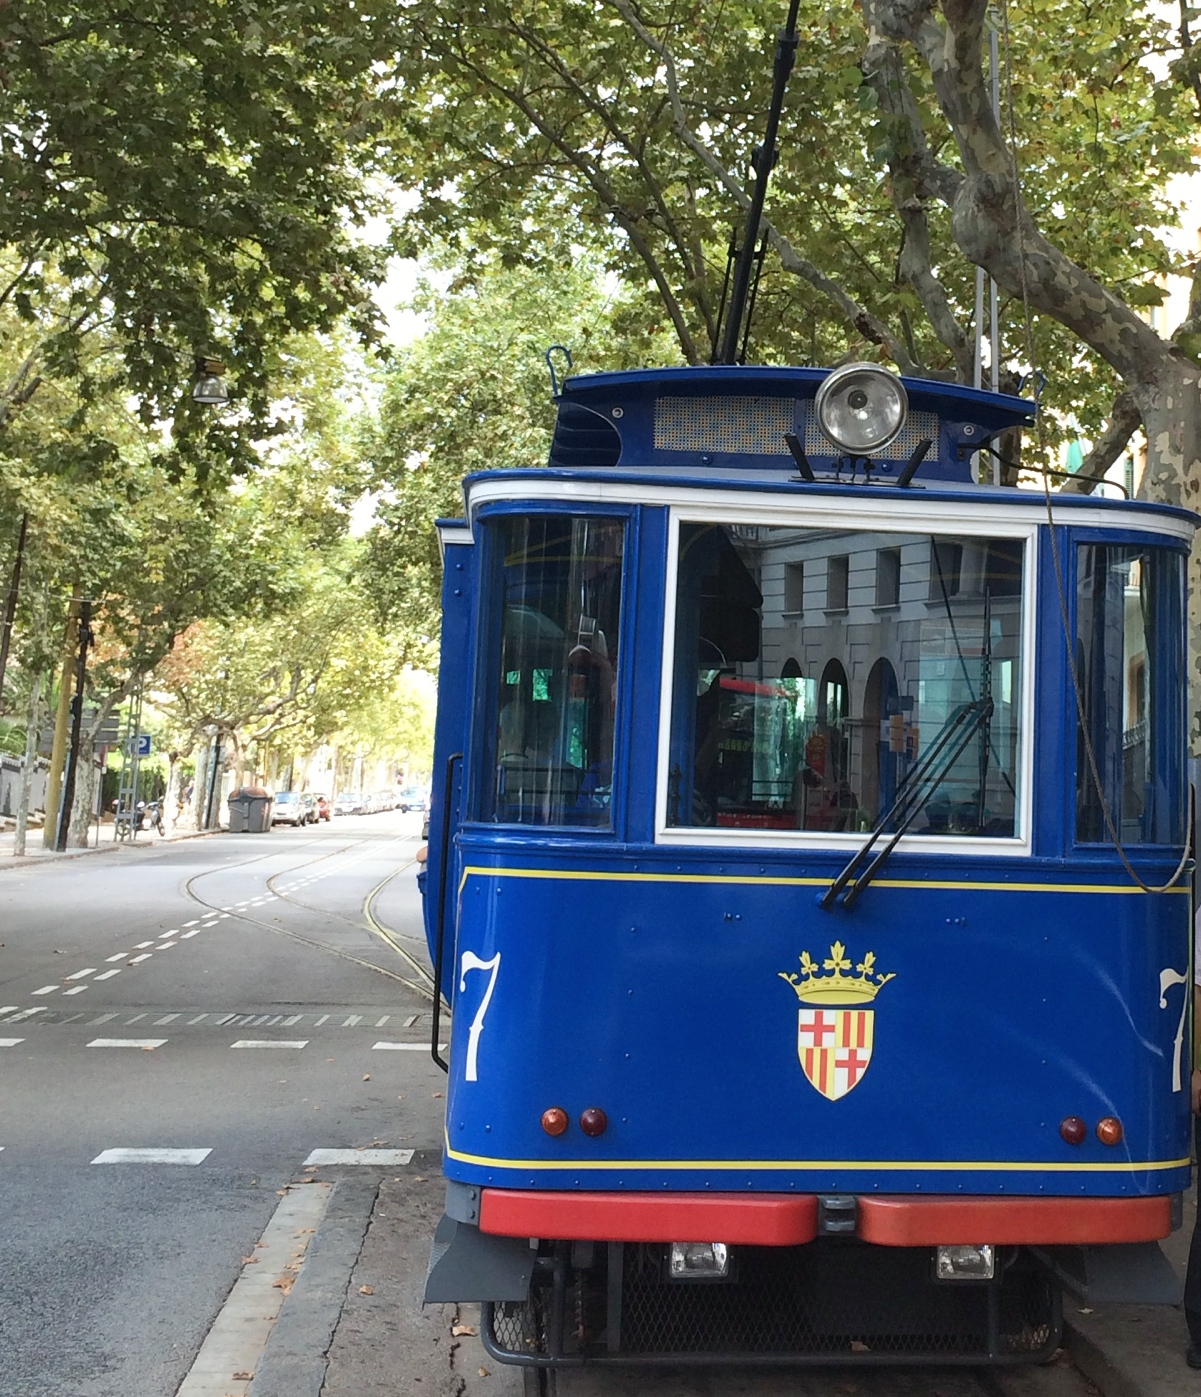 Cable-car-Tibidabo-barcelona